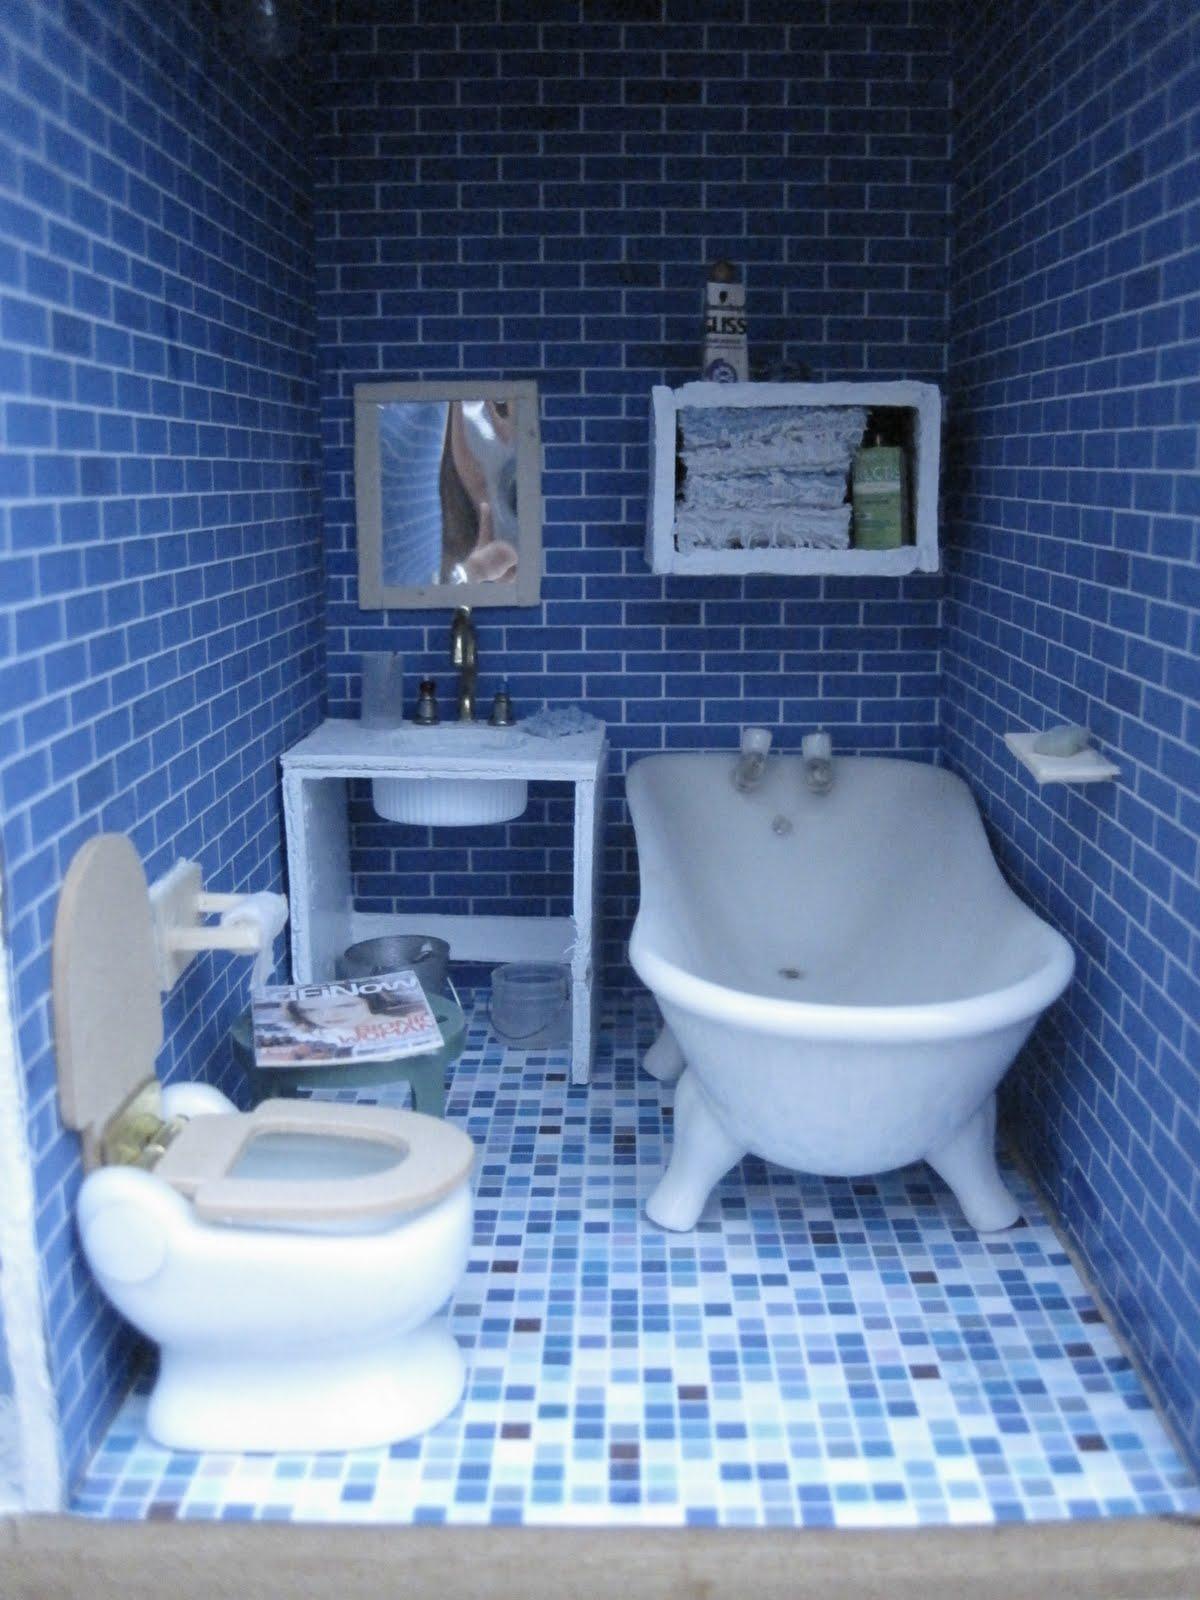 Dollhouses are cool Bathroom sink